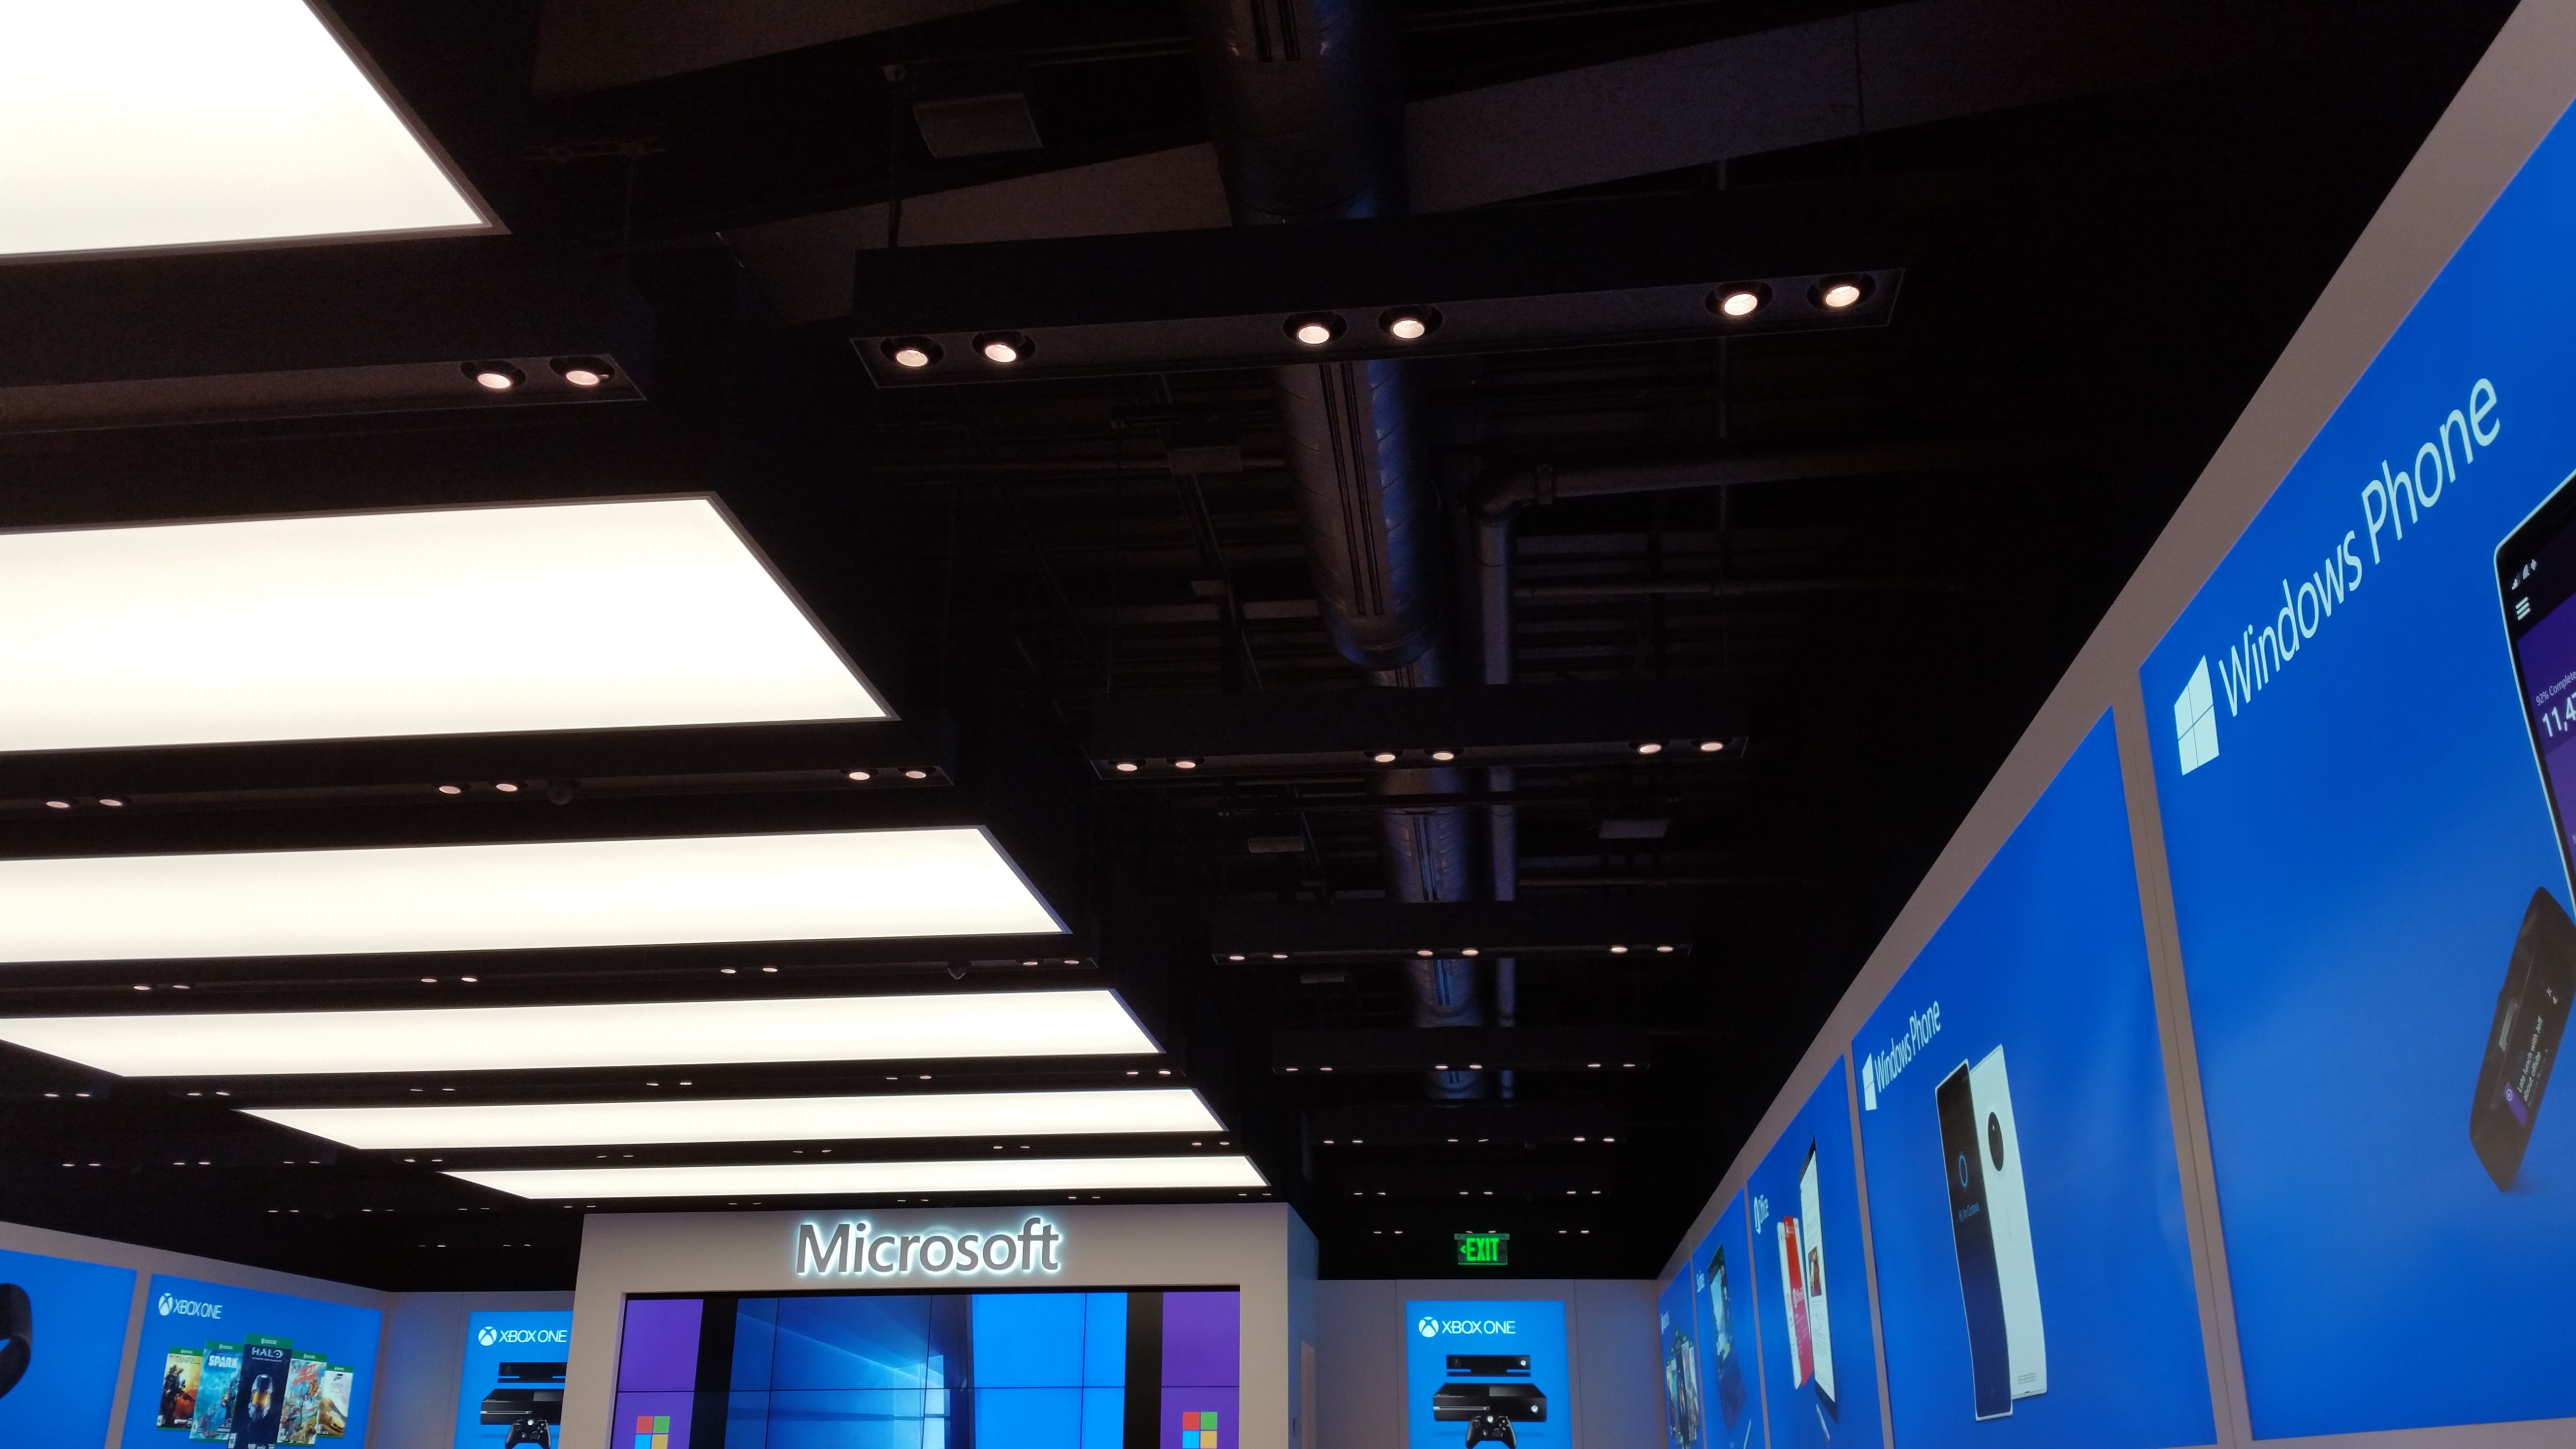 Microsoft Chandler Mall